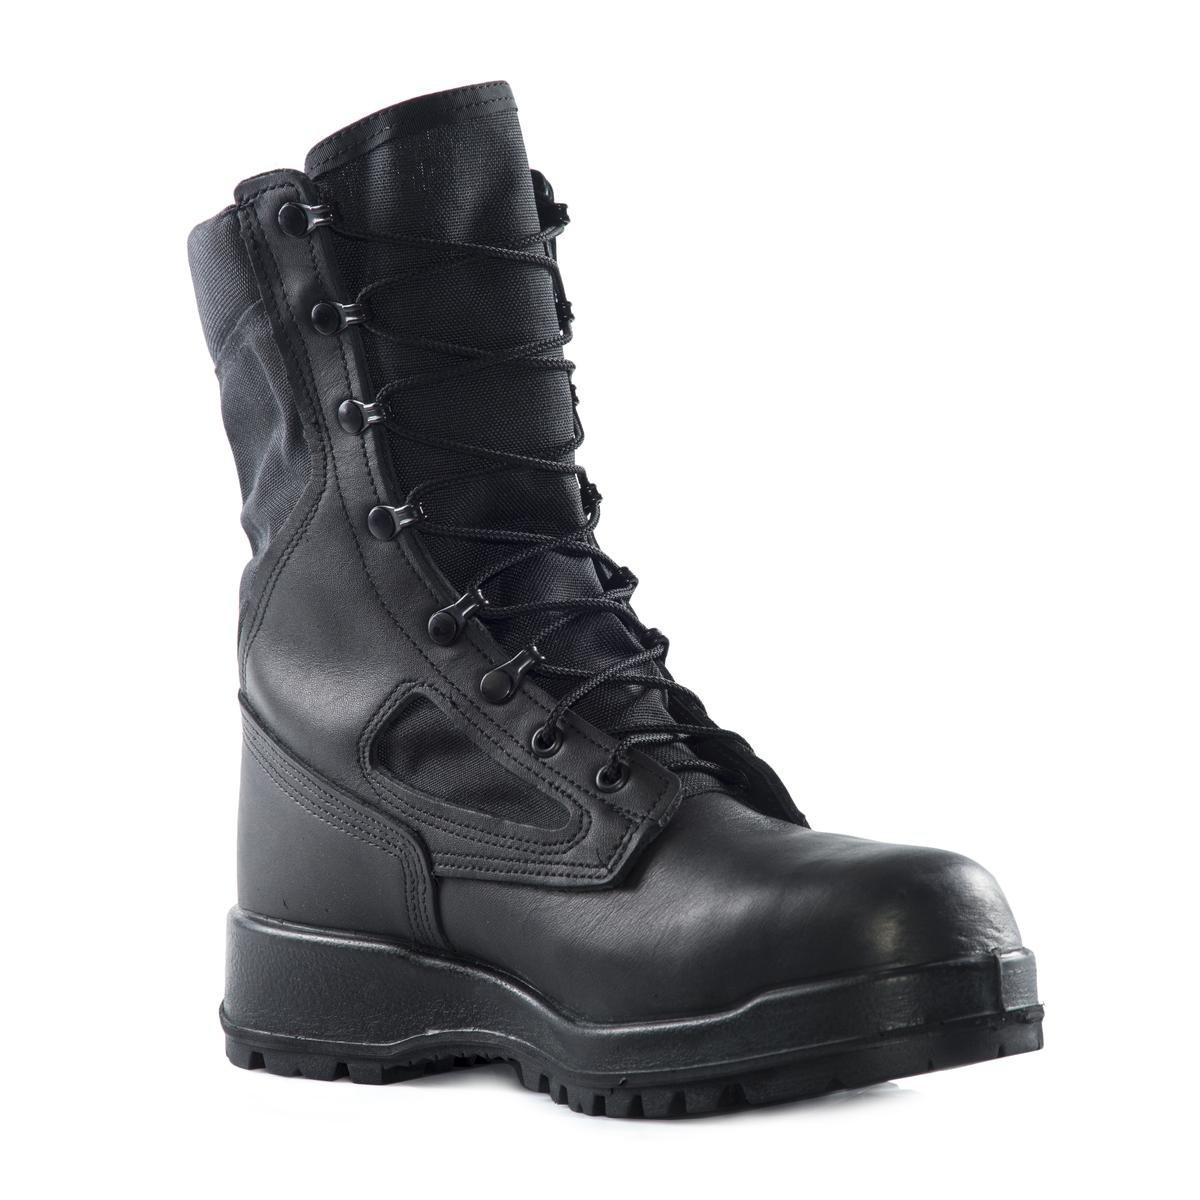 Belleville 300TROPST Men's 8-in ST EH Tactical Boot Black 7 W US